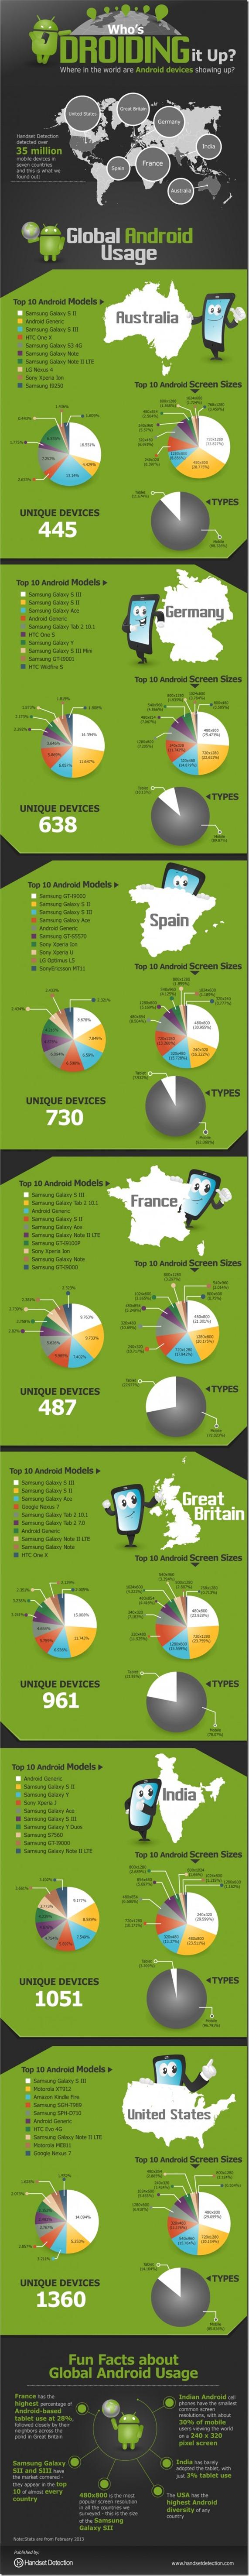 android global usage - unpocogeek.com